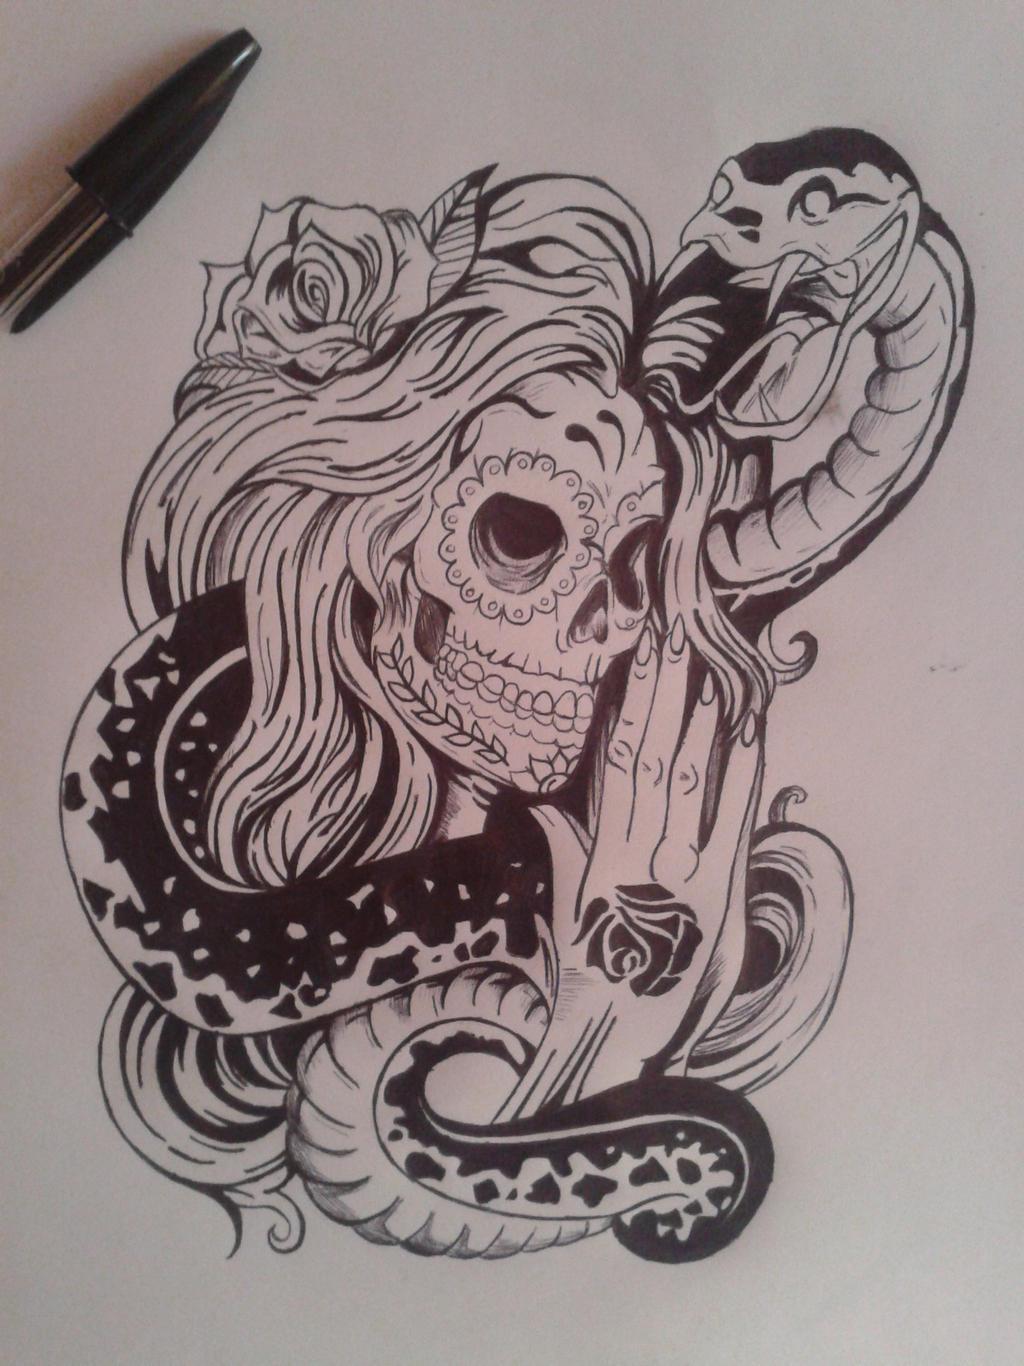 Santa Muerte 3 By Sabraina On DeviantArt